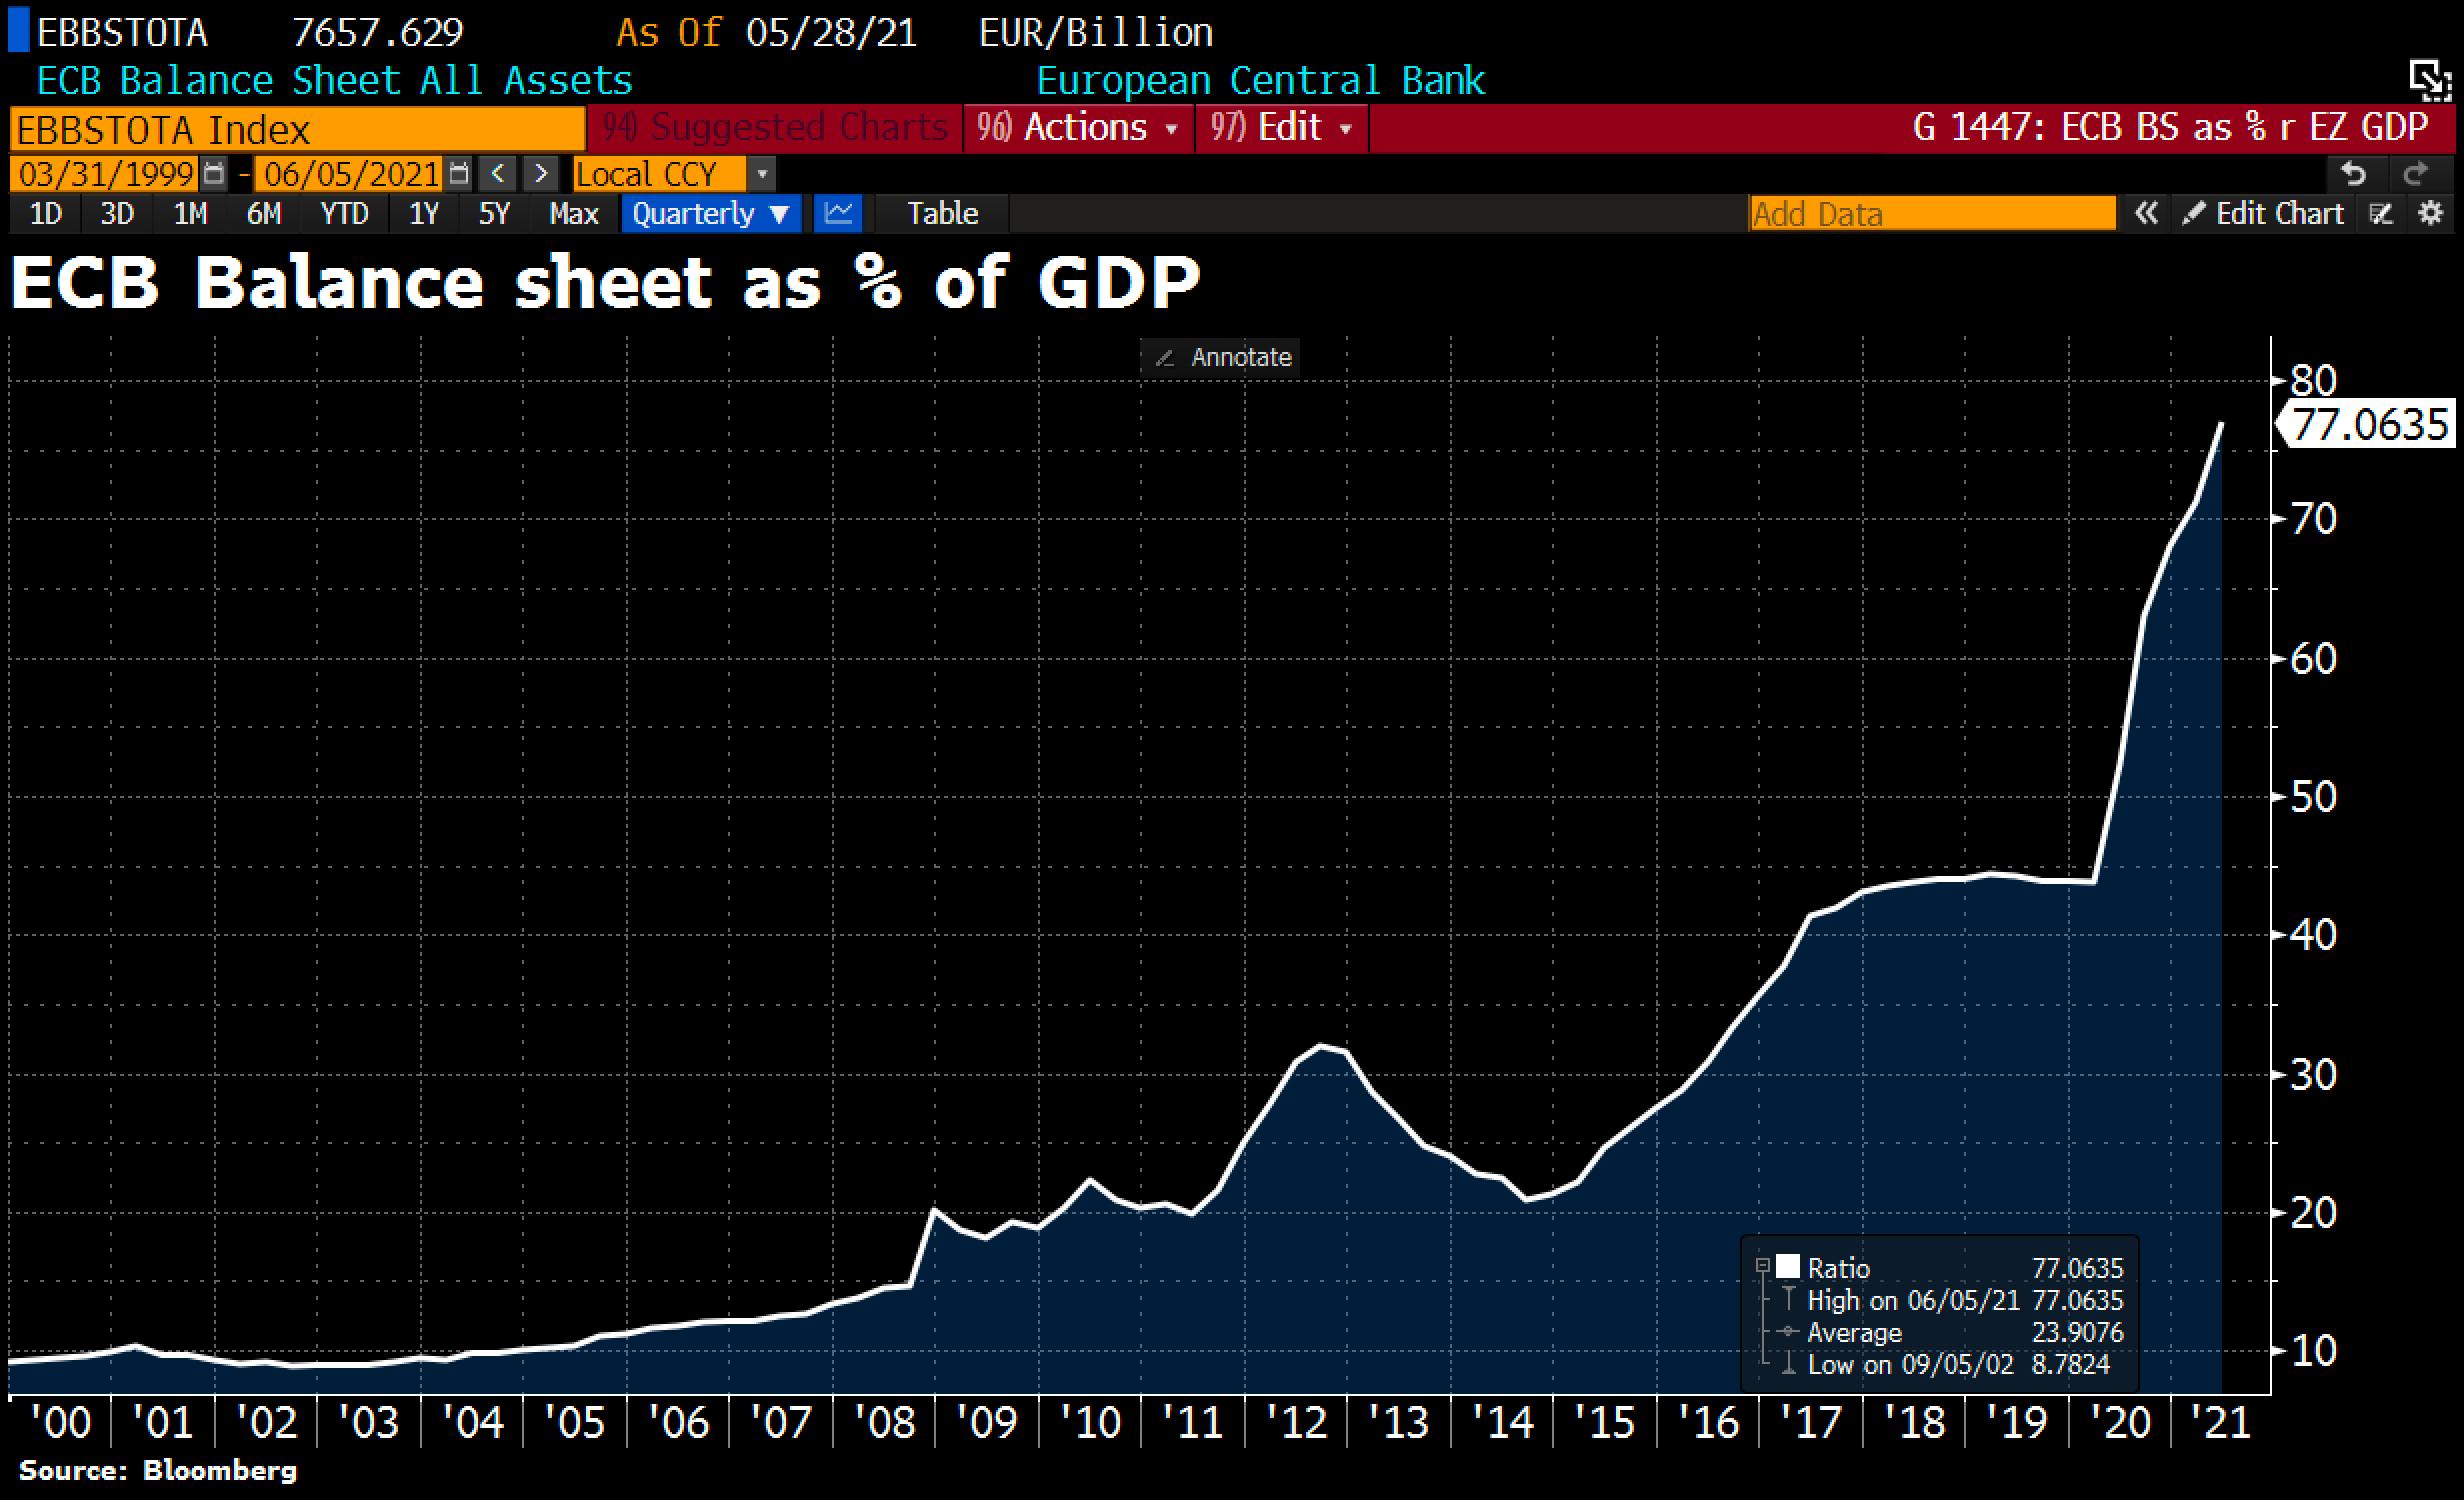 ECB Balance Sheet. © Holger Zschaepitz via Twitter @Schuldensuehner, June 5th, 2021.